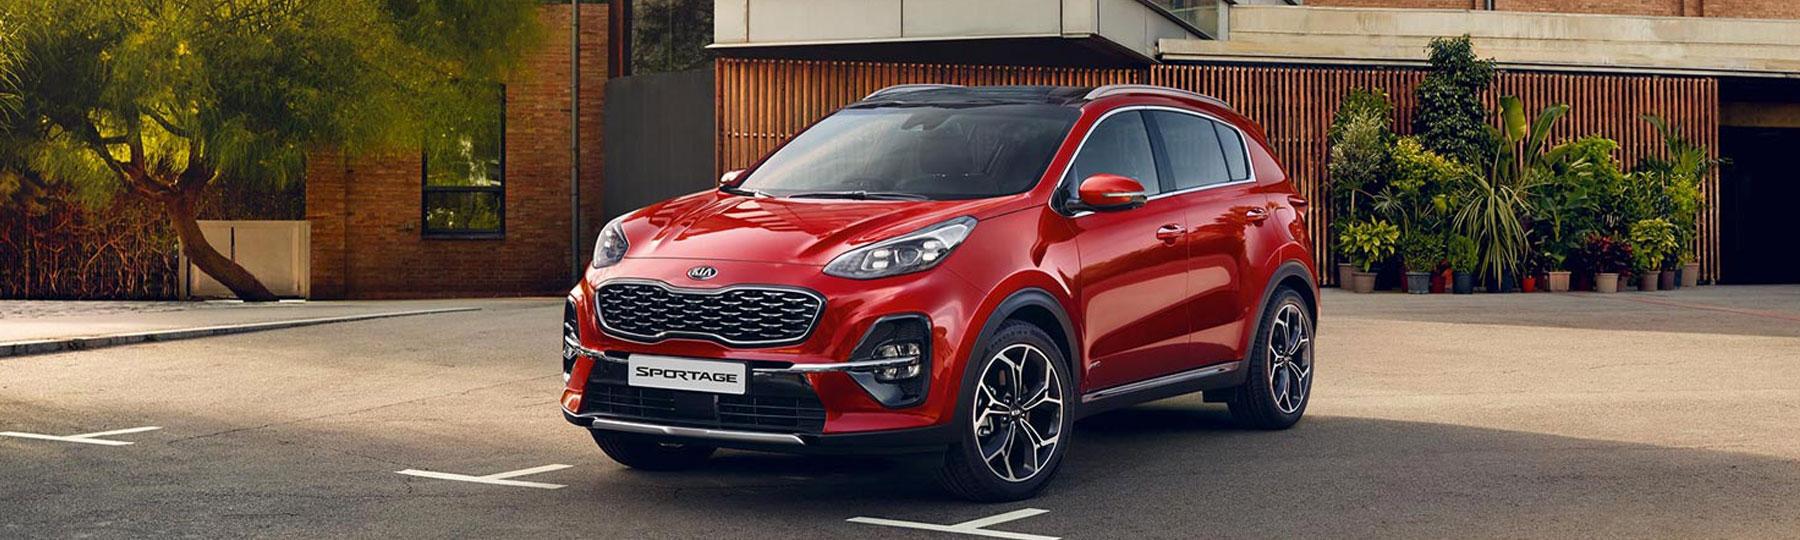 kia Sportage New Car Offer